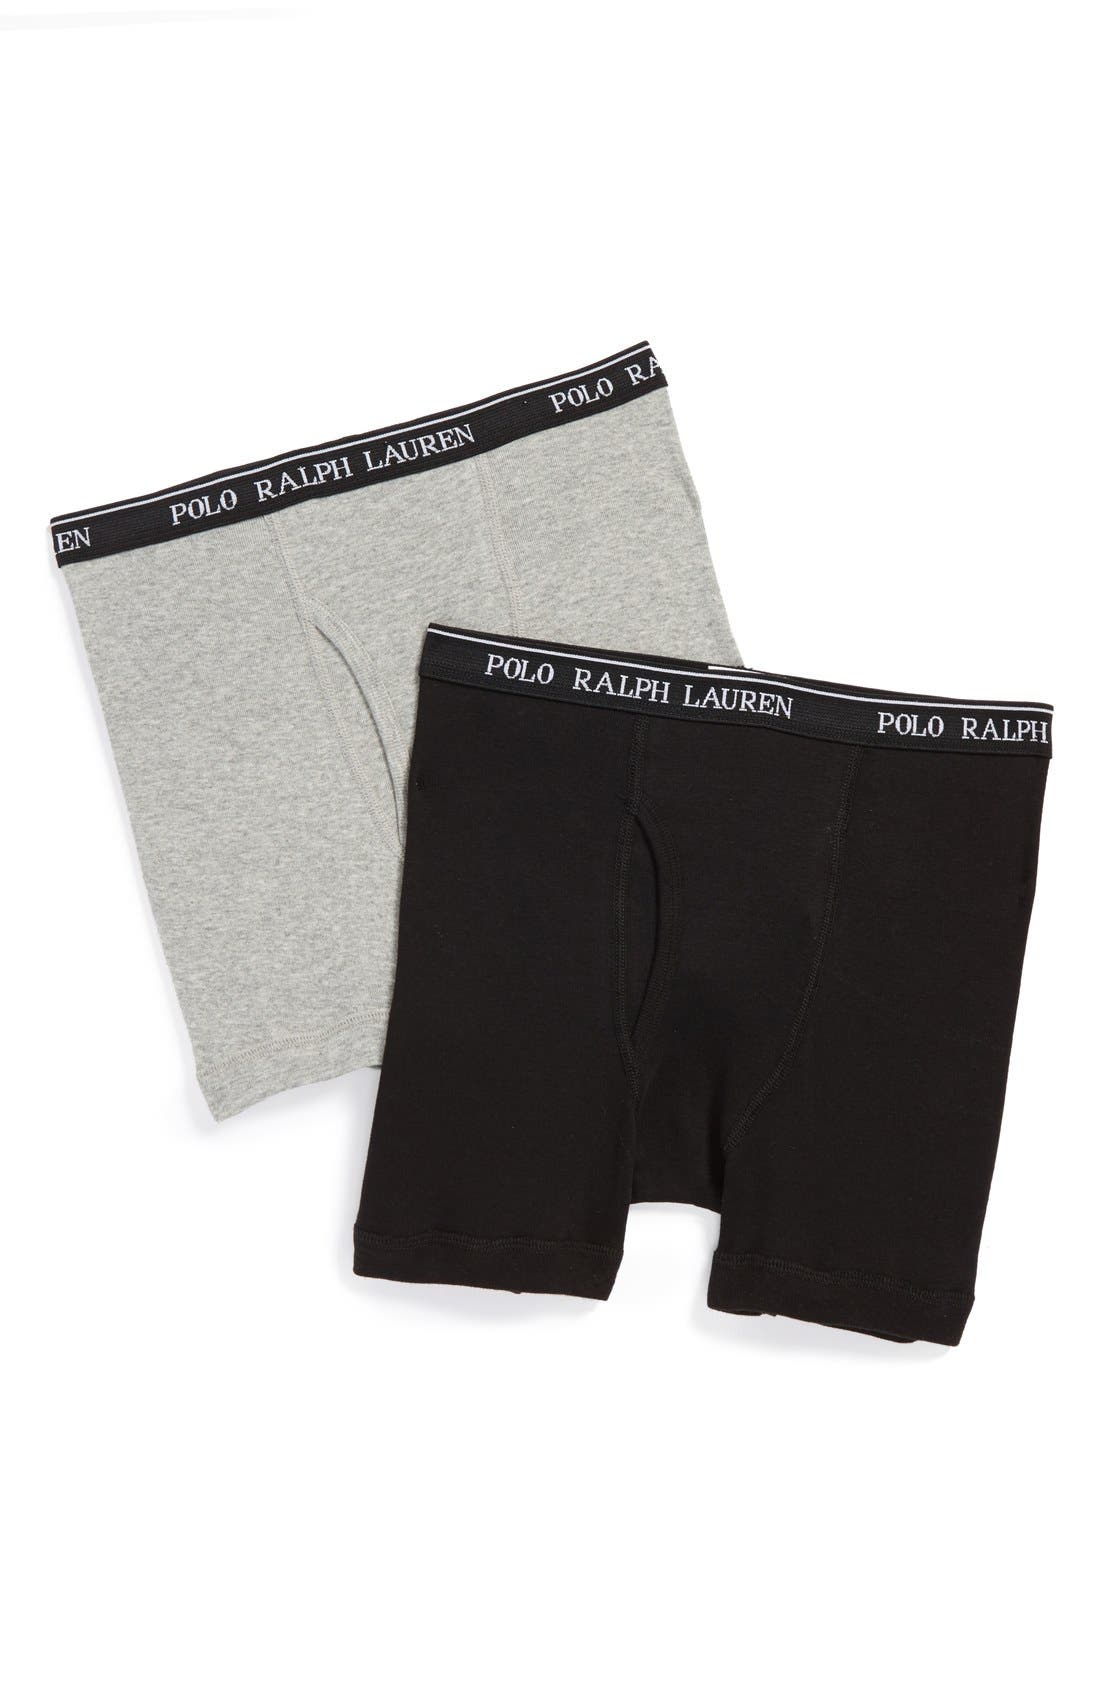 POLO RALPH LAUREN 2-Pack Boxer Briefs